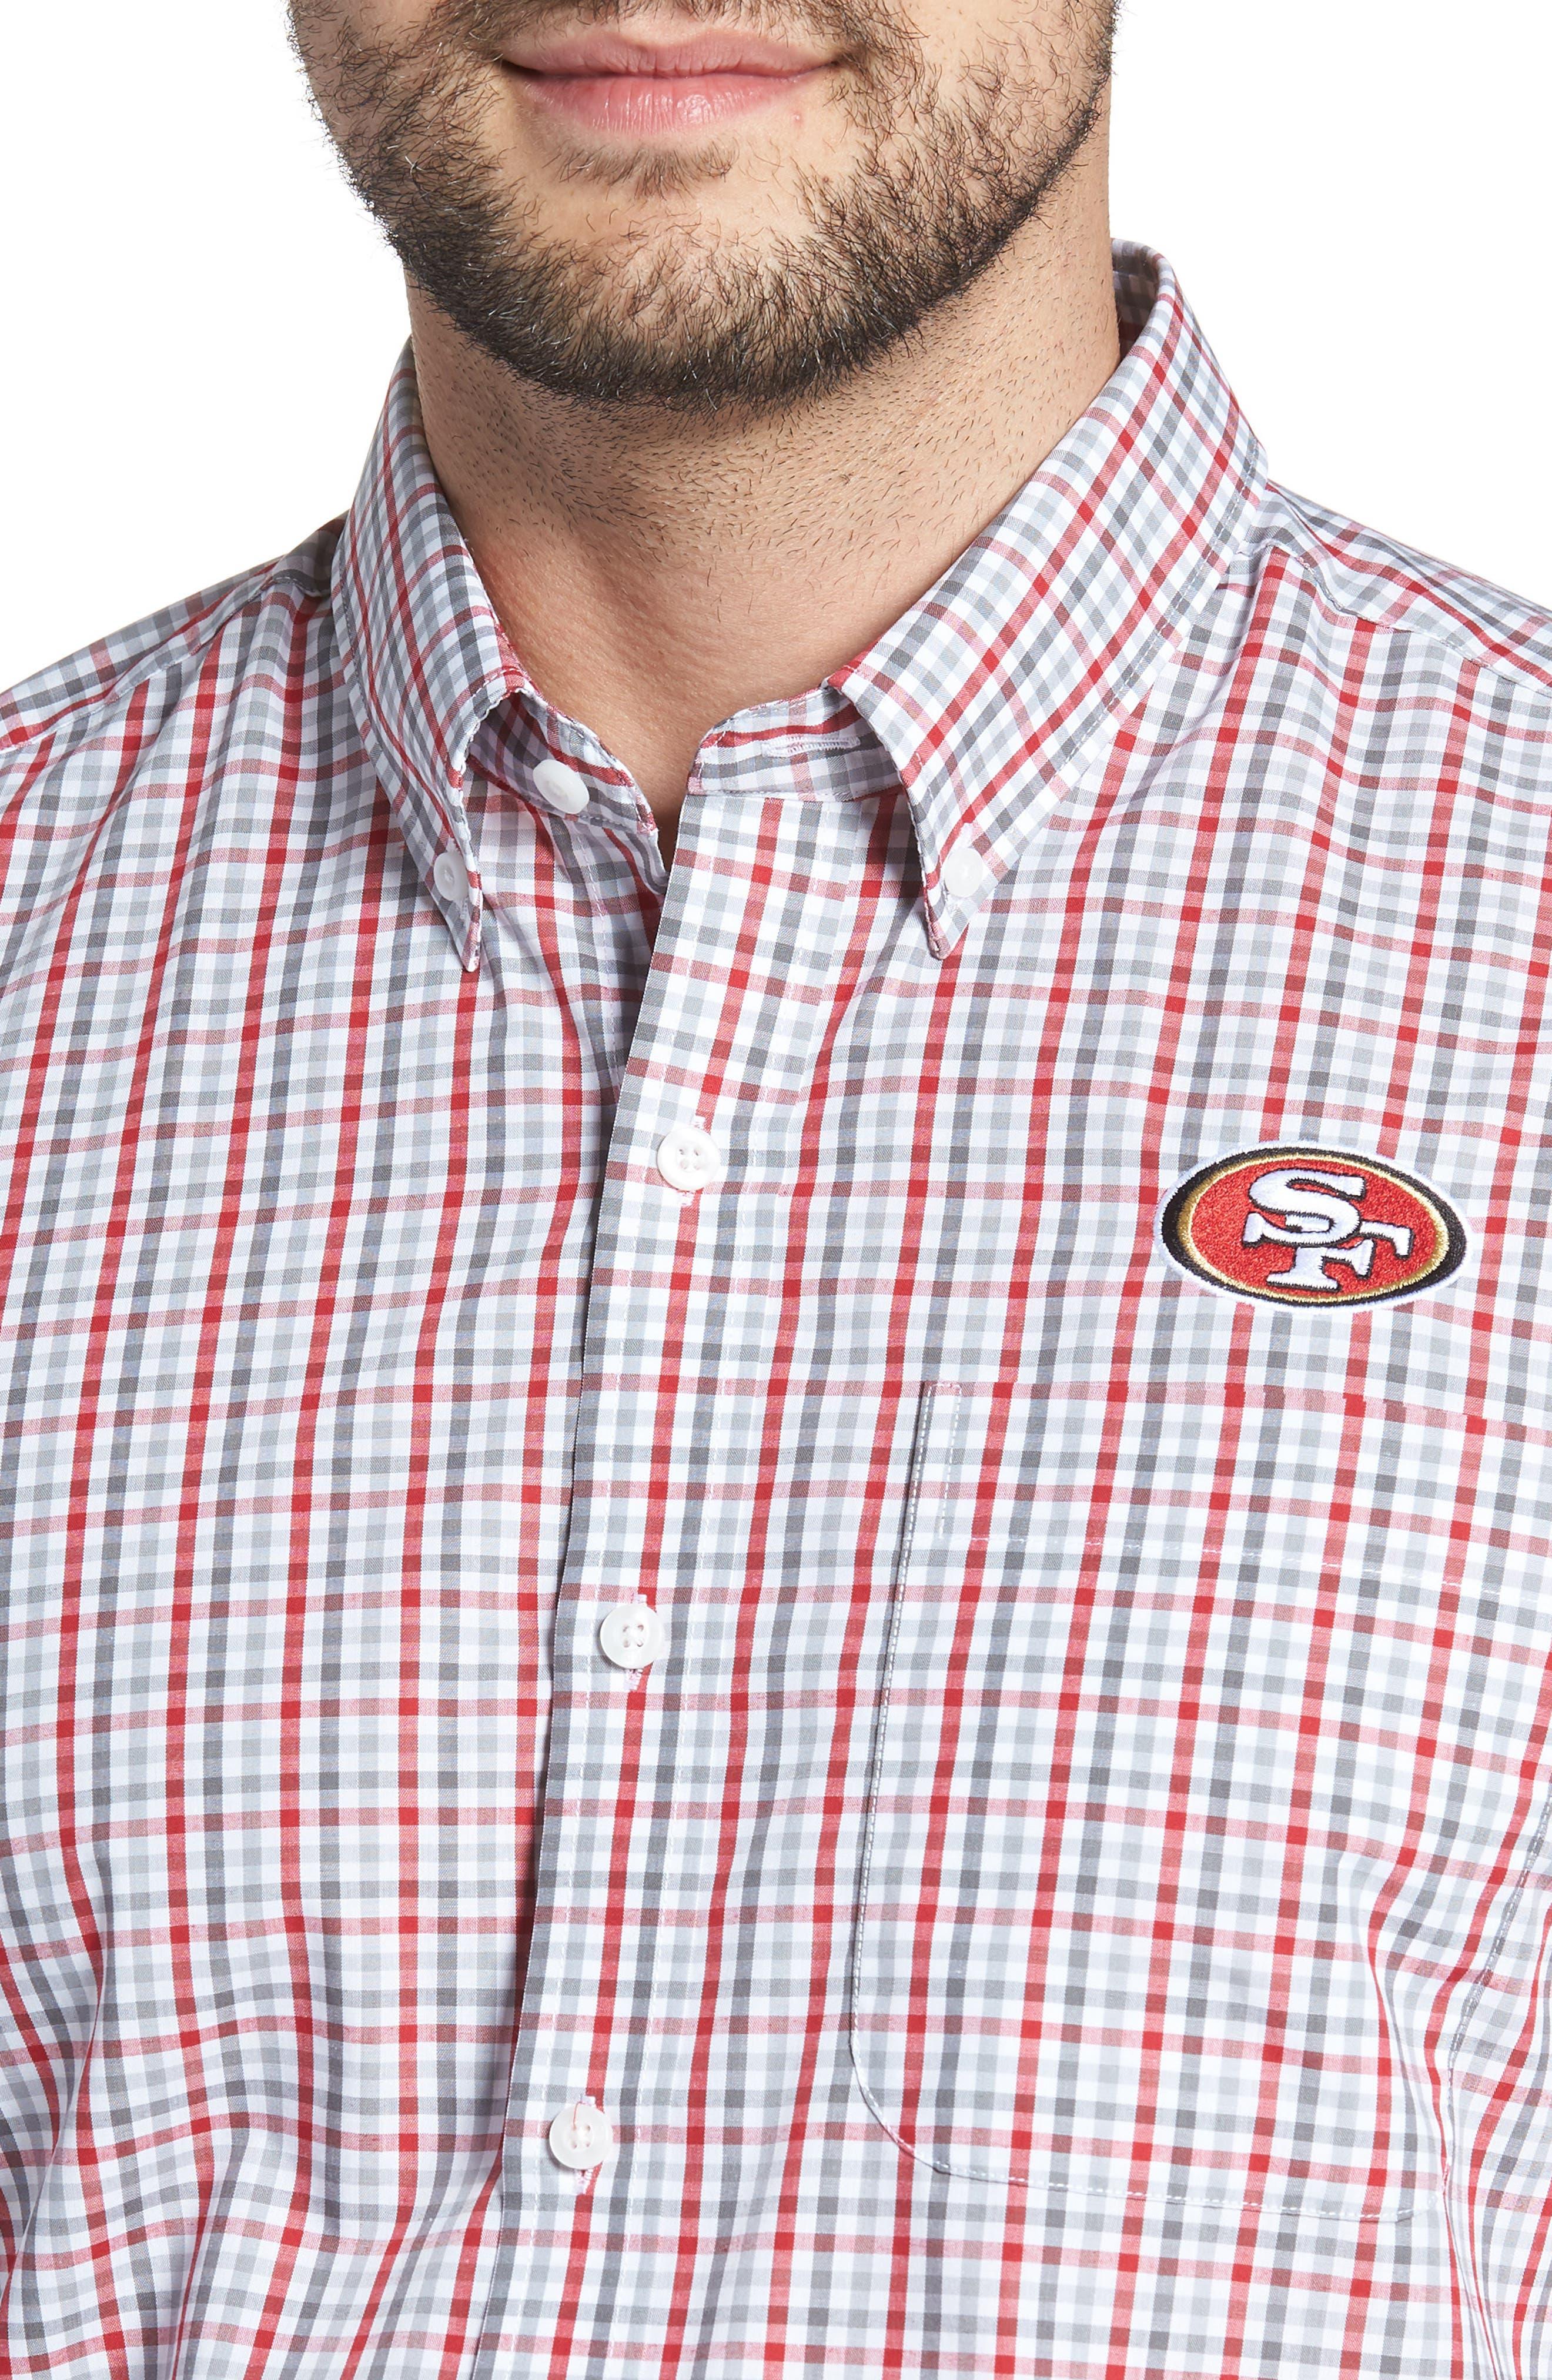 San Francisco 49ers - Gilman Regular Fit Plaid Sport Shirt,                             Alternate thumbnail 4, color,                             CARDINAL RED